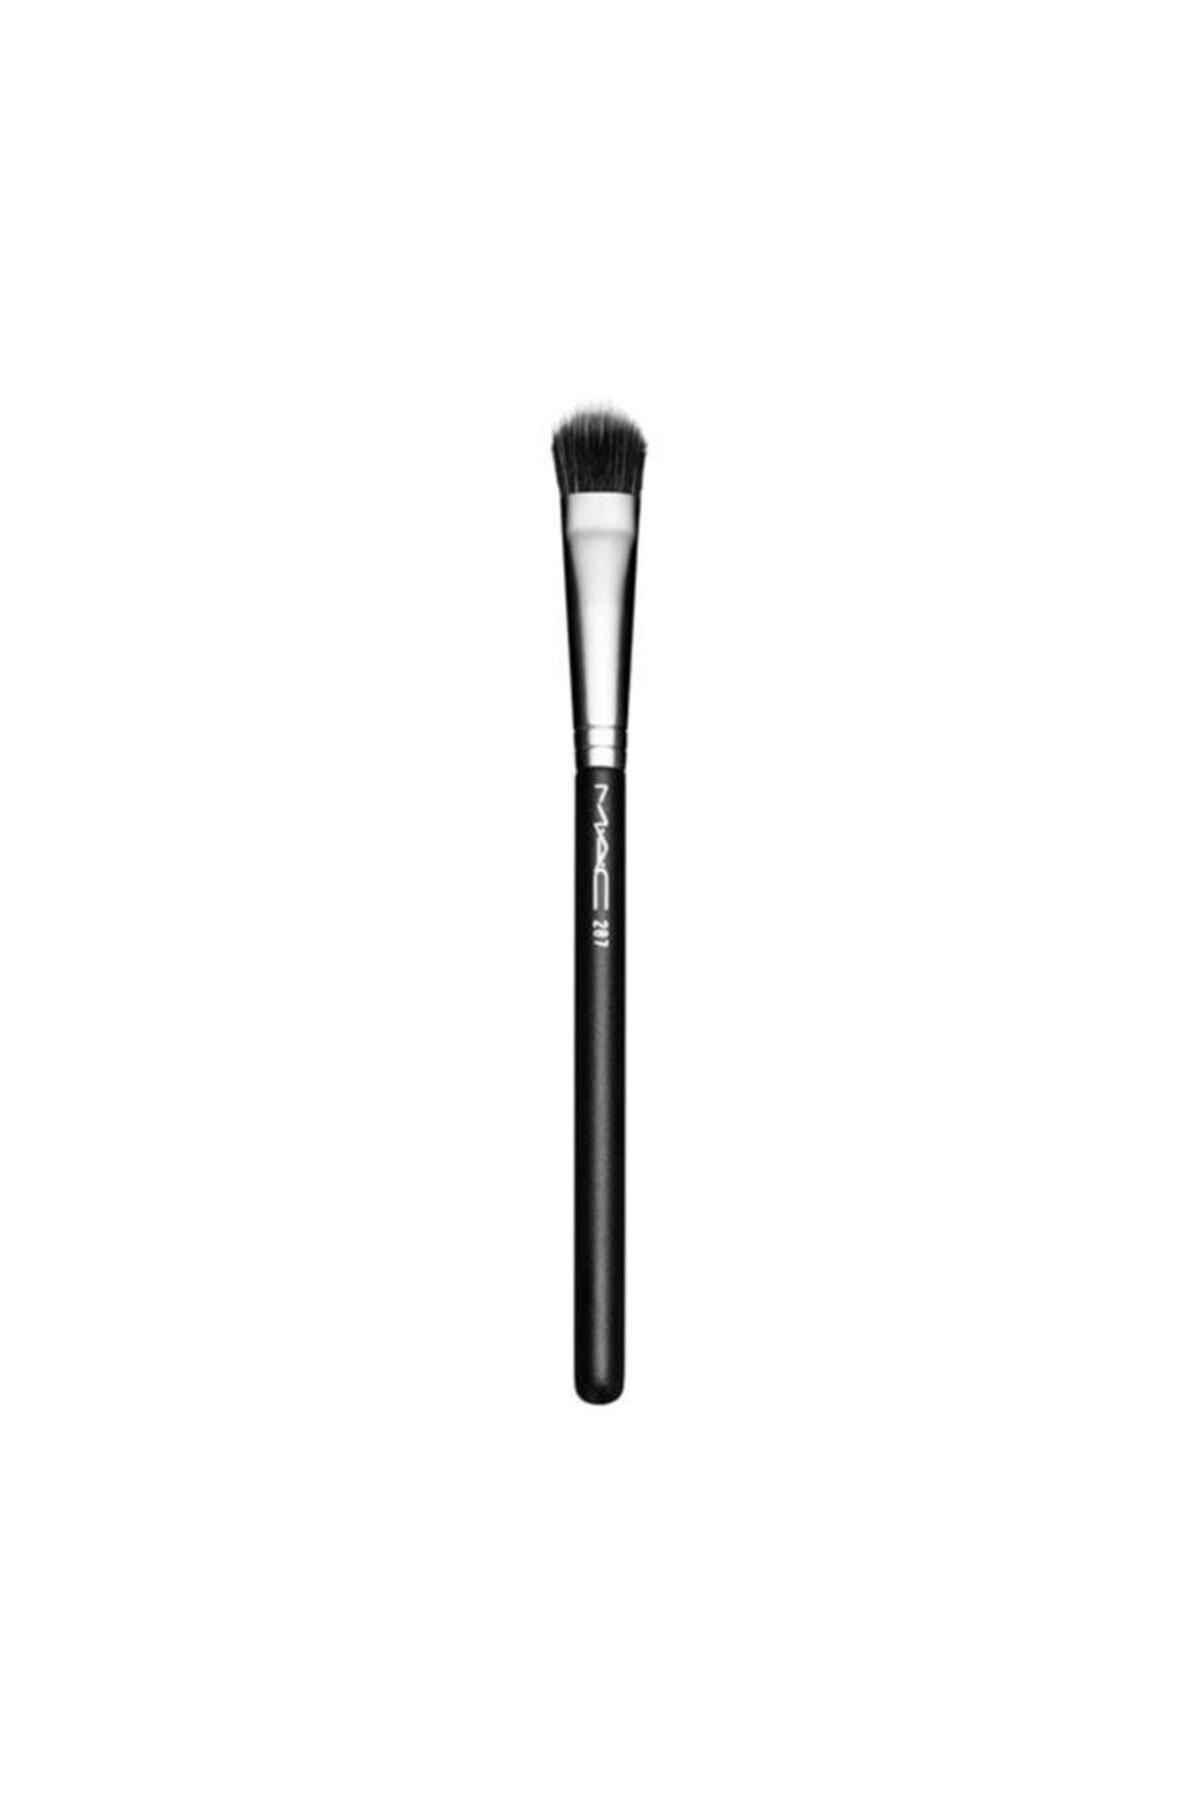 M.A.C Göz Farı Fırçası - 287 Duo Fibre Eye Shadow Brush 773602406661 2